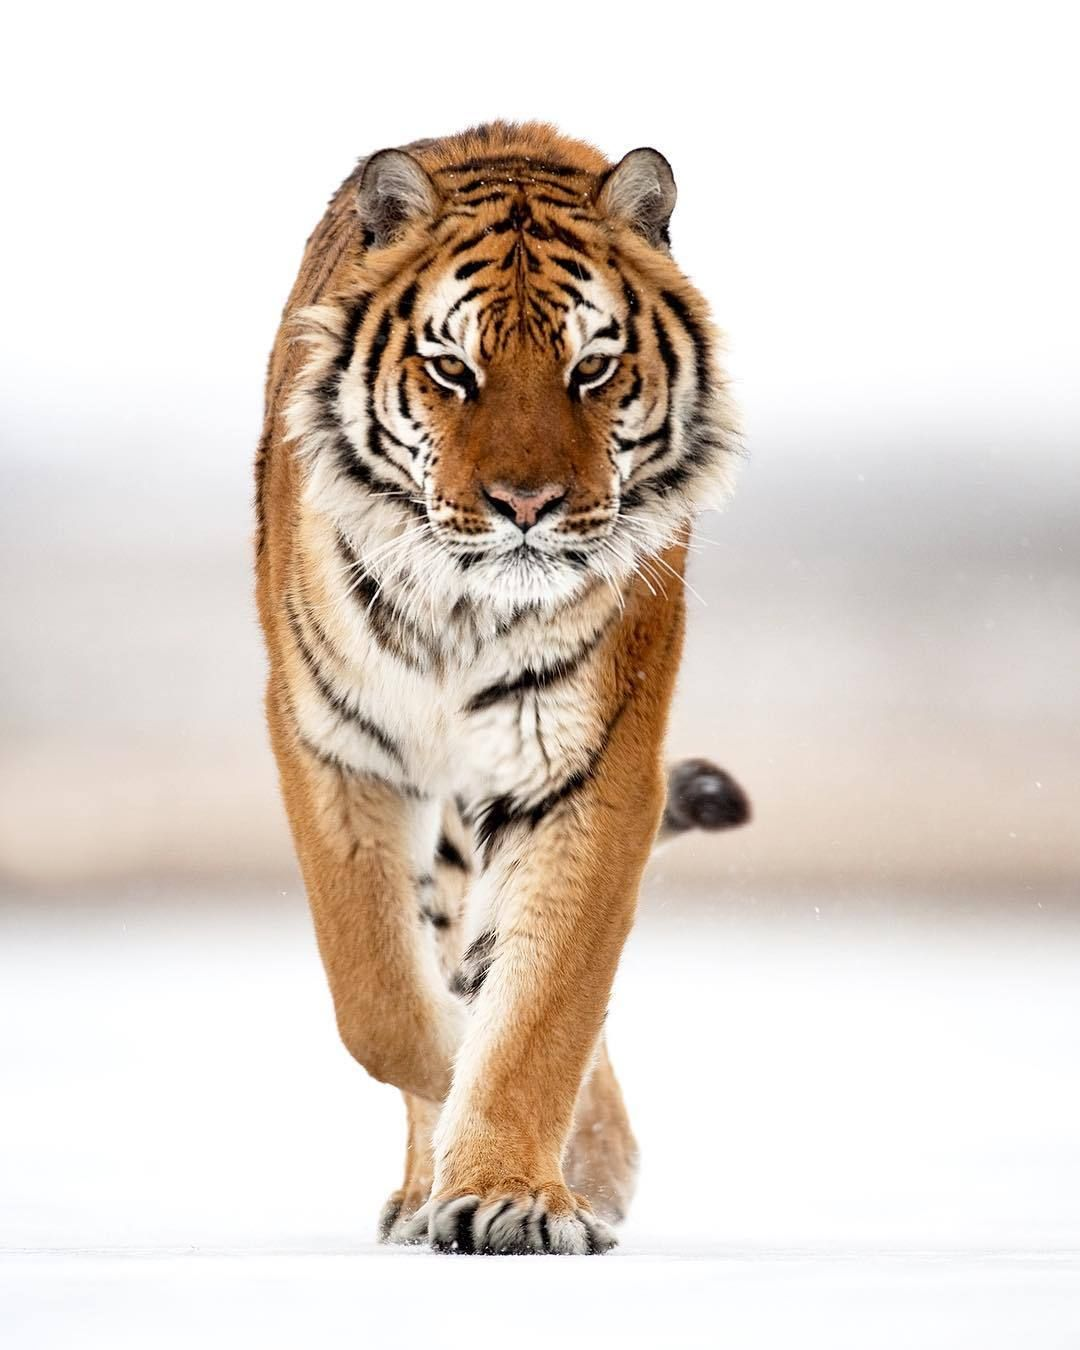 Amur Tiger by suhaderbent - Suha Derbent